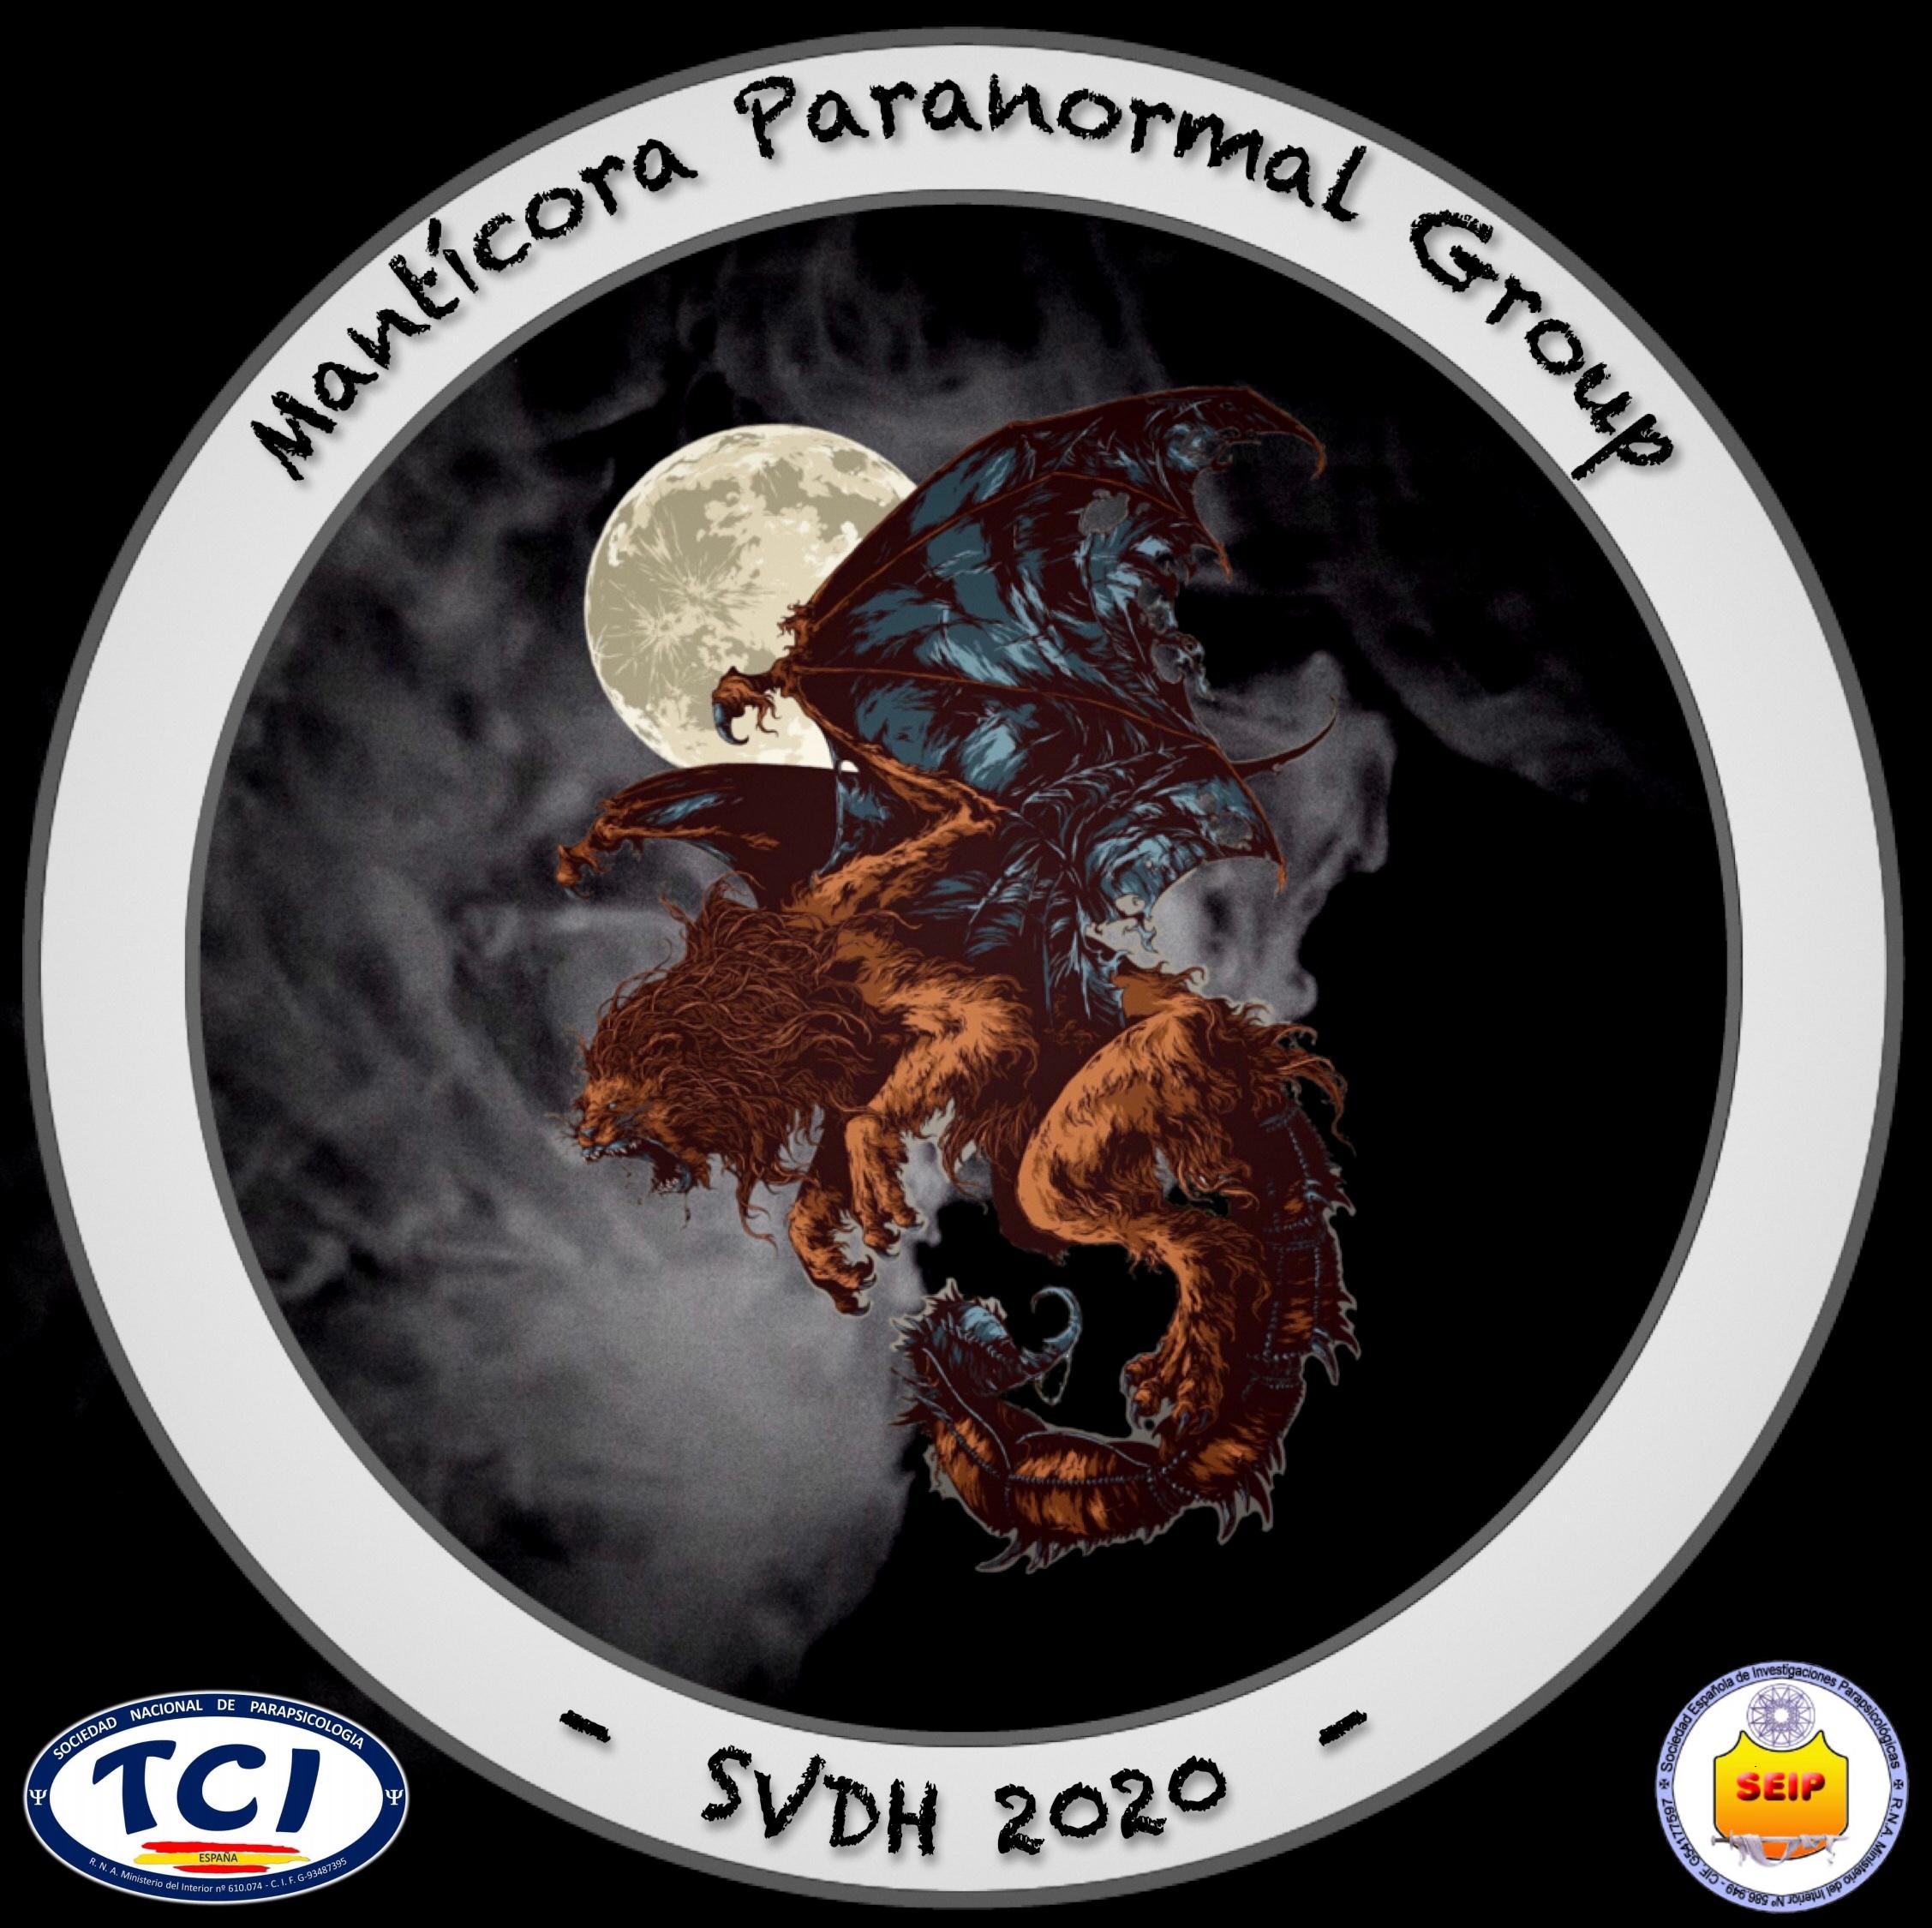 Mantícora Paranormal Group